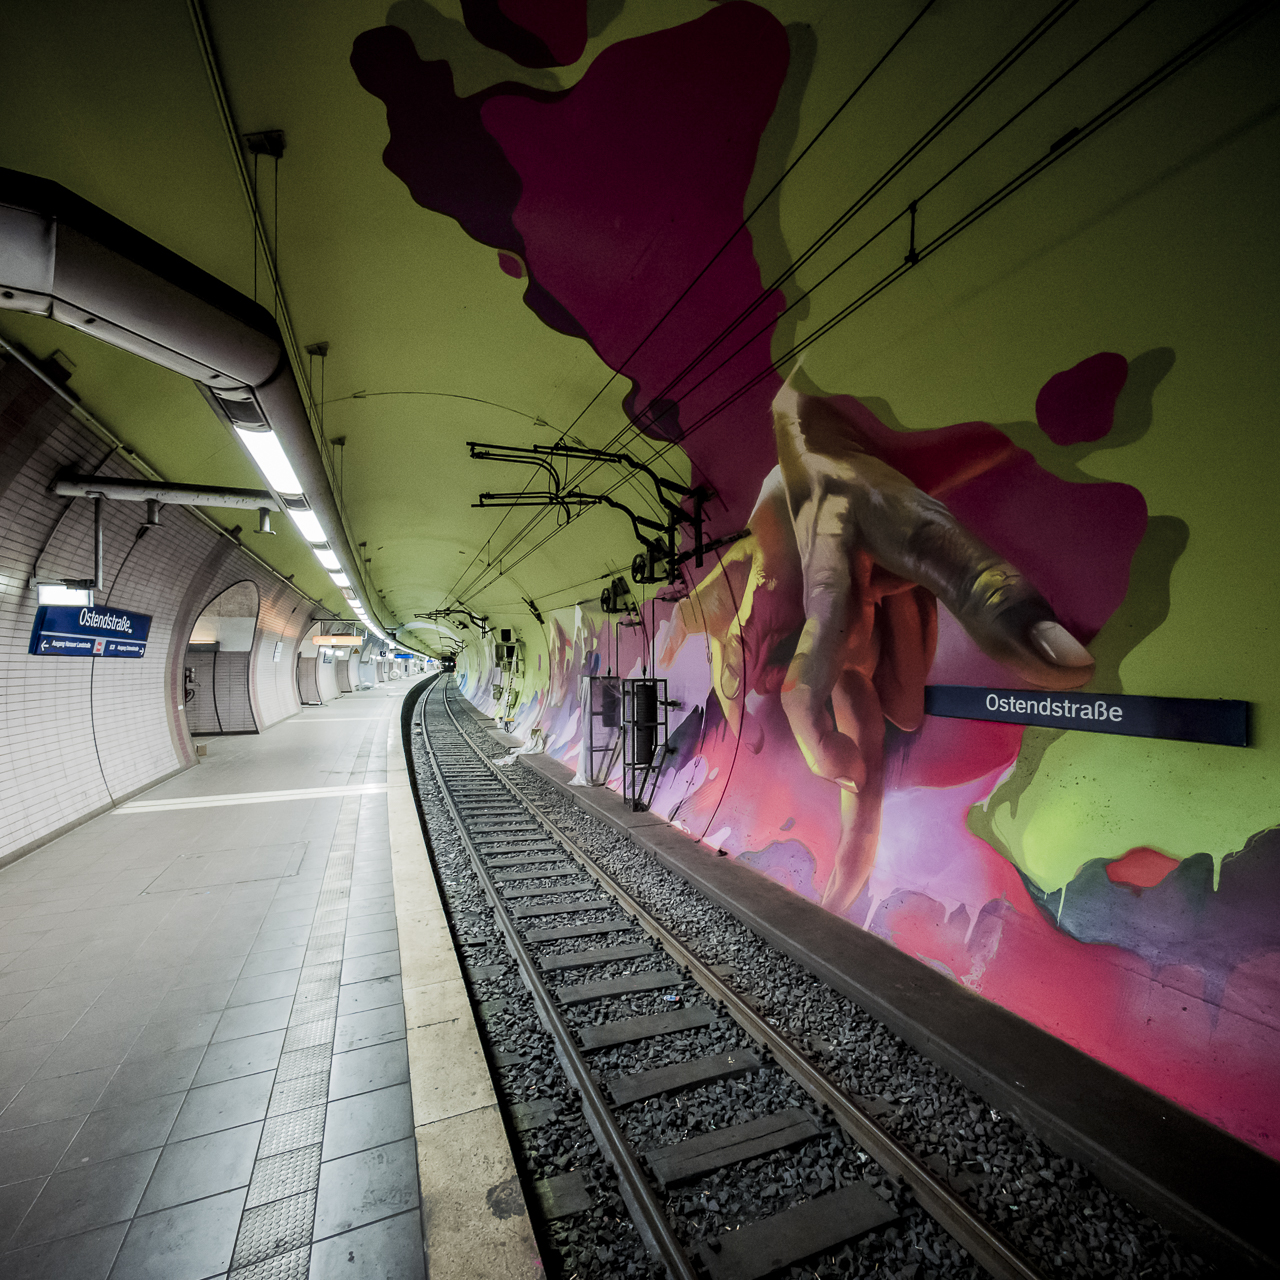 A work by Does - Ostendstrasse frankfurt germany tunnel rudi 6